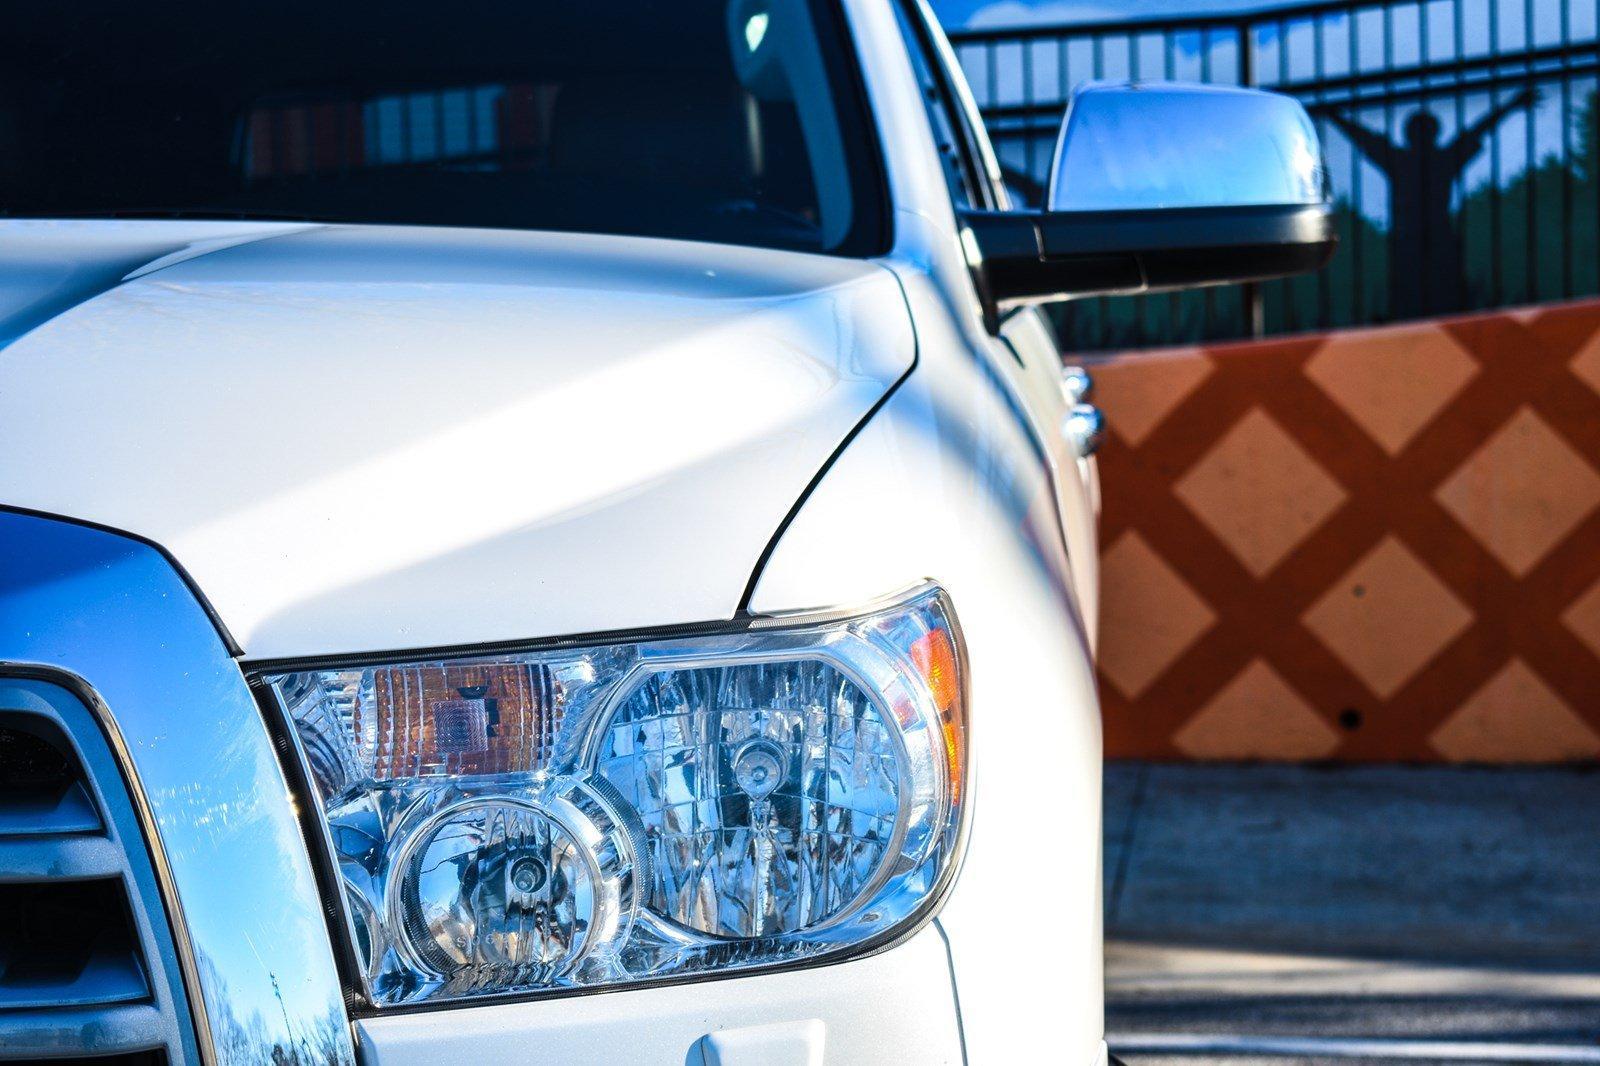 Sandy Springs Toyota >> 2016 Toyota Sequoia Platinum Stock # 062909 for sale near Sandy Springs, GA | GA Toyota Dealer